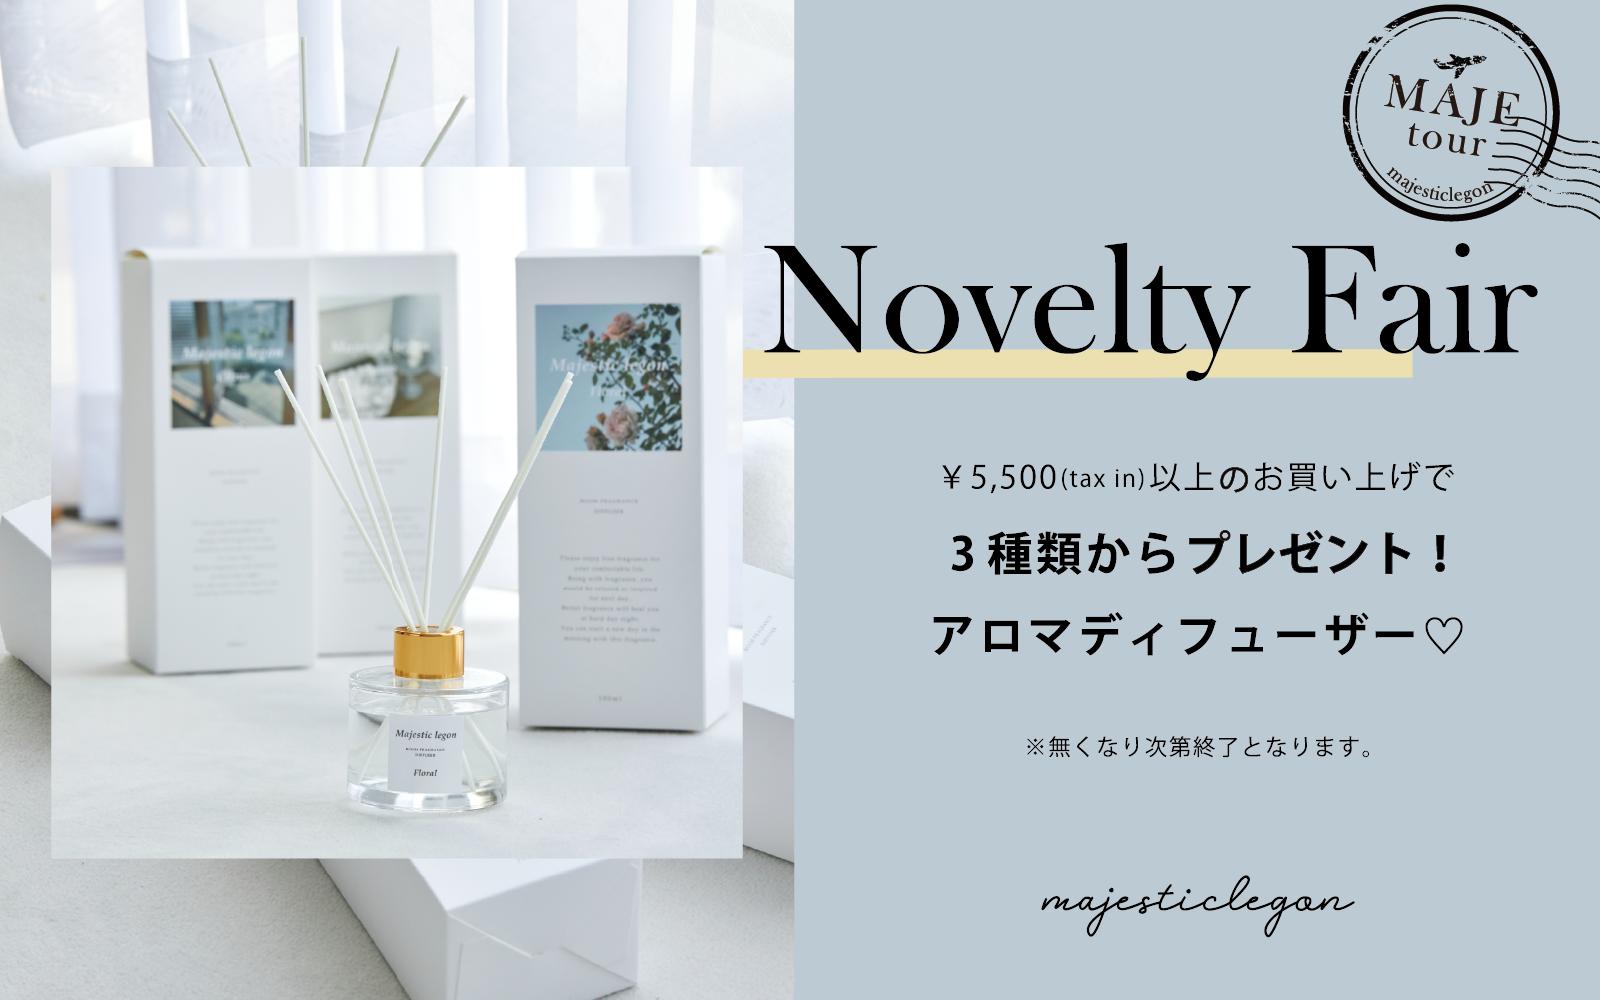 【MAJE tour】ノベルティフェア 4.29.thu.START